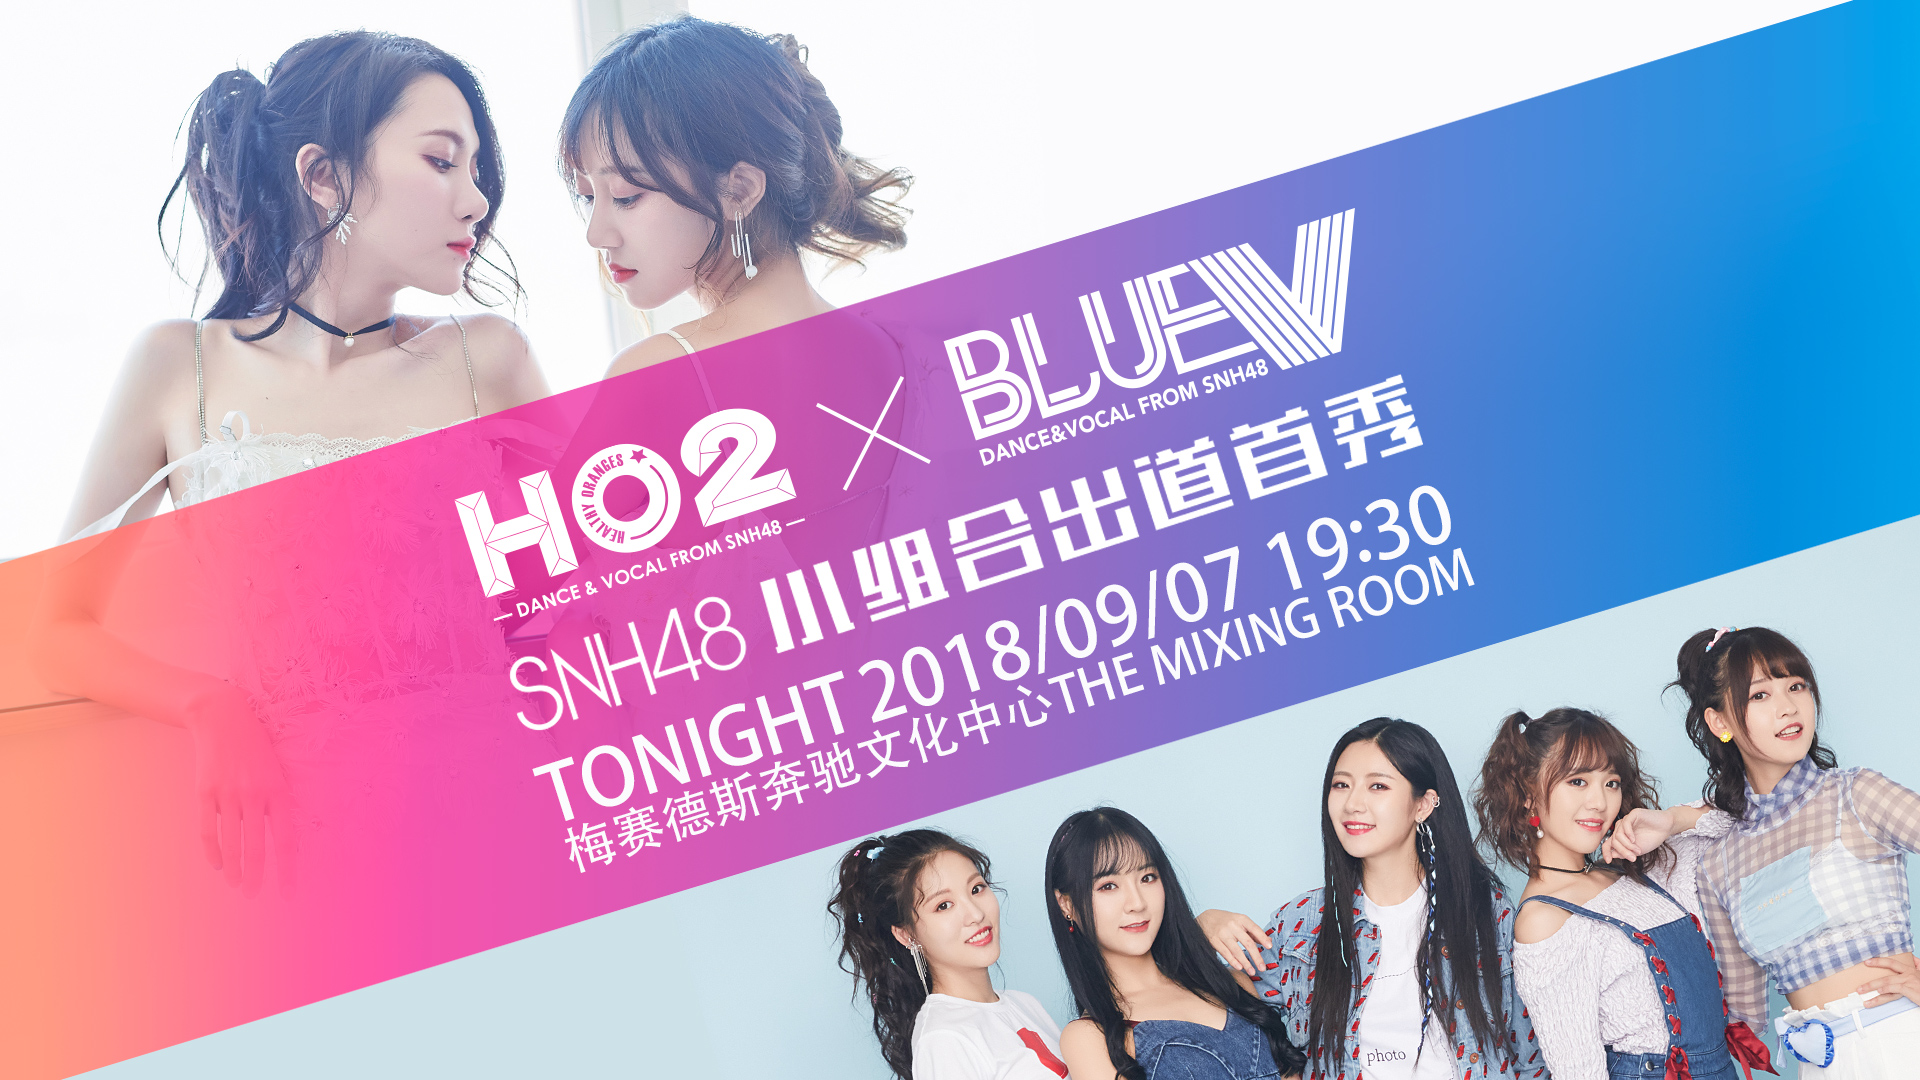 SNH48小组合HO2 、BLUEV出道首秀 全新组合闪耀来袭